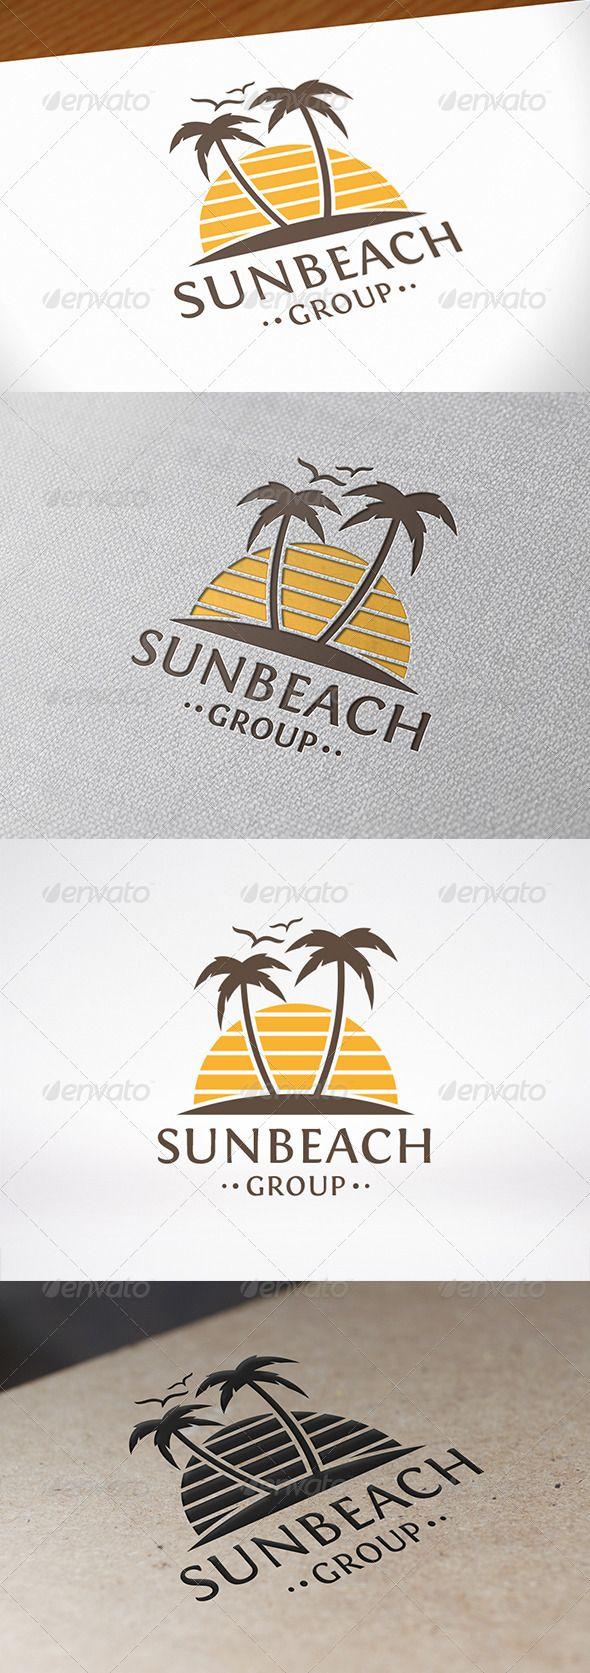 Sun Beach - Logo Design Template Vector #logotype Download it here: http://graphicriver.net/item/sun-beach-logo-template/8108793?s_rank=1411?ref=nexion